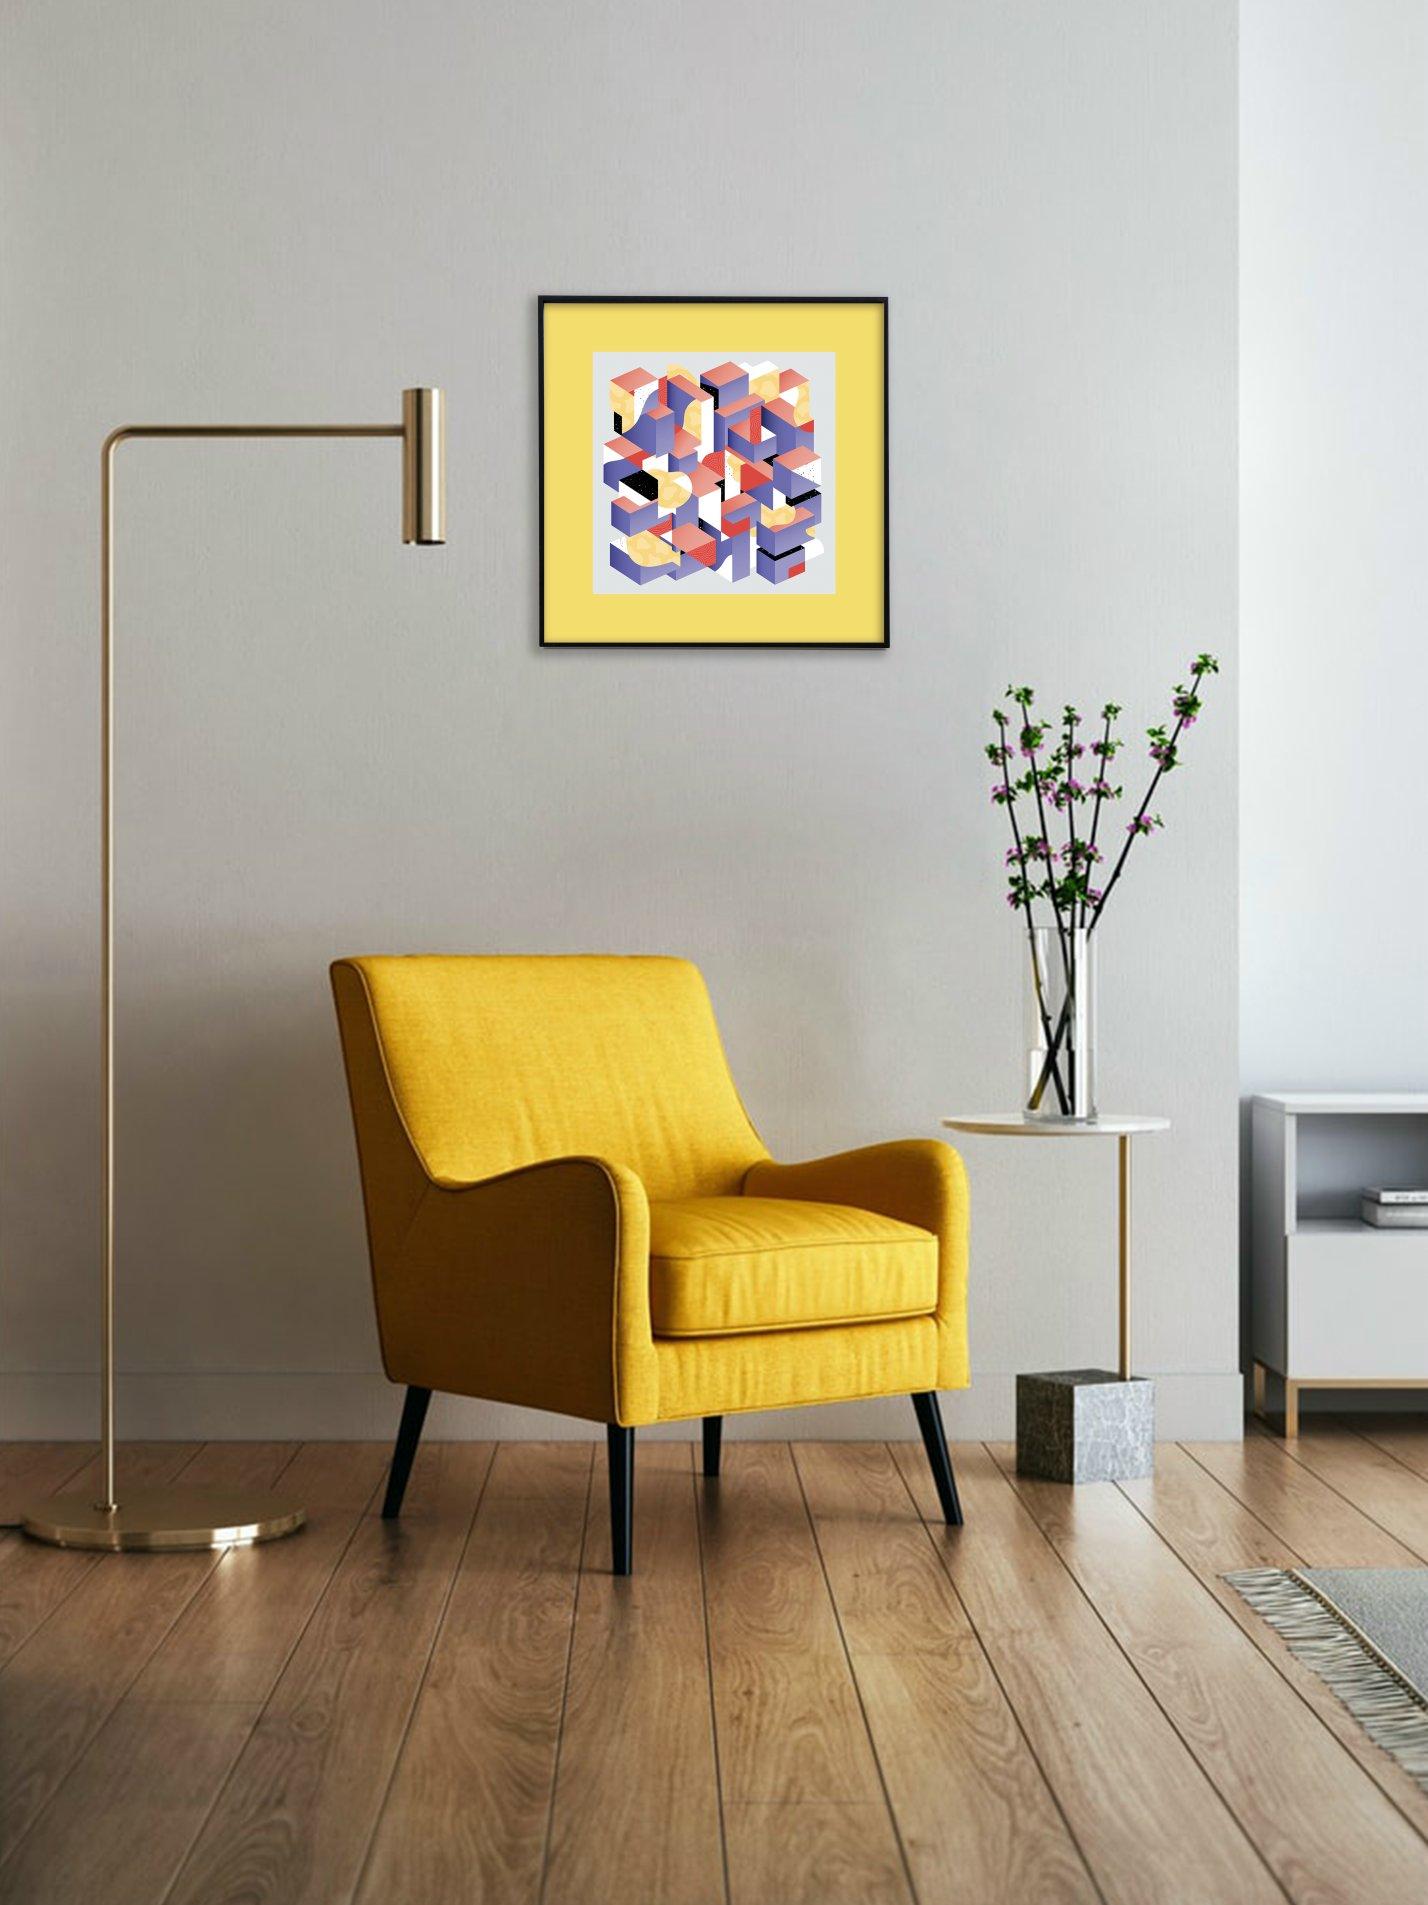 Untitled Geometric - yellow